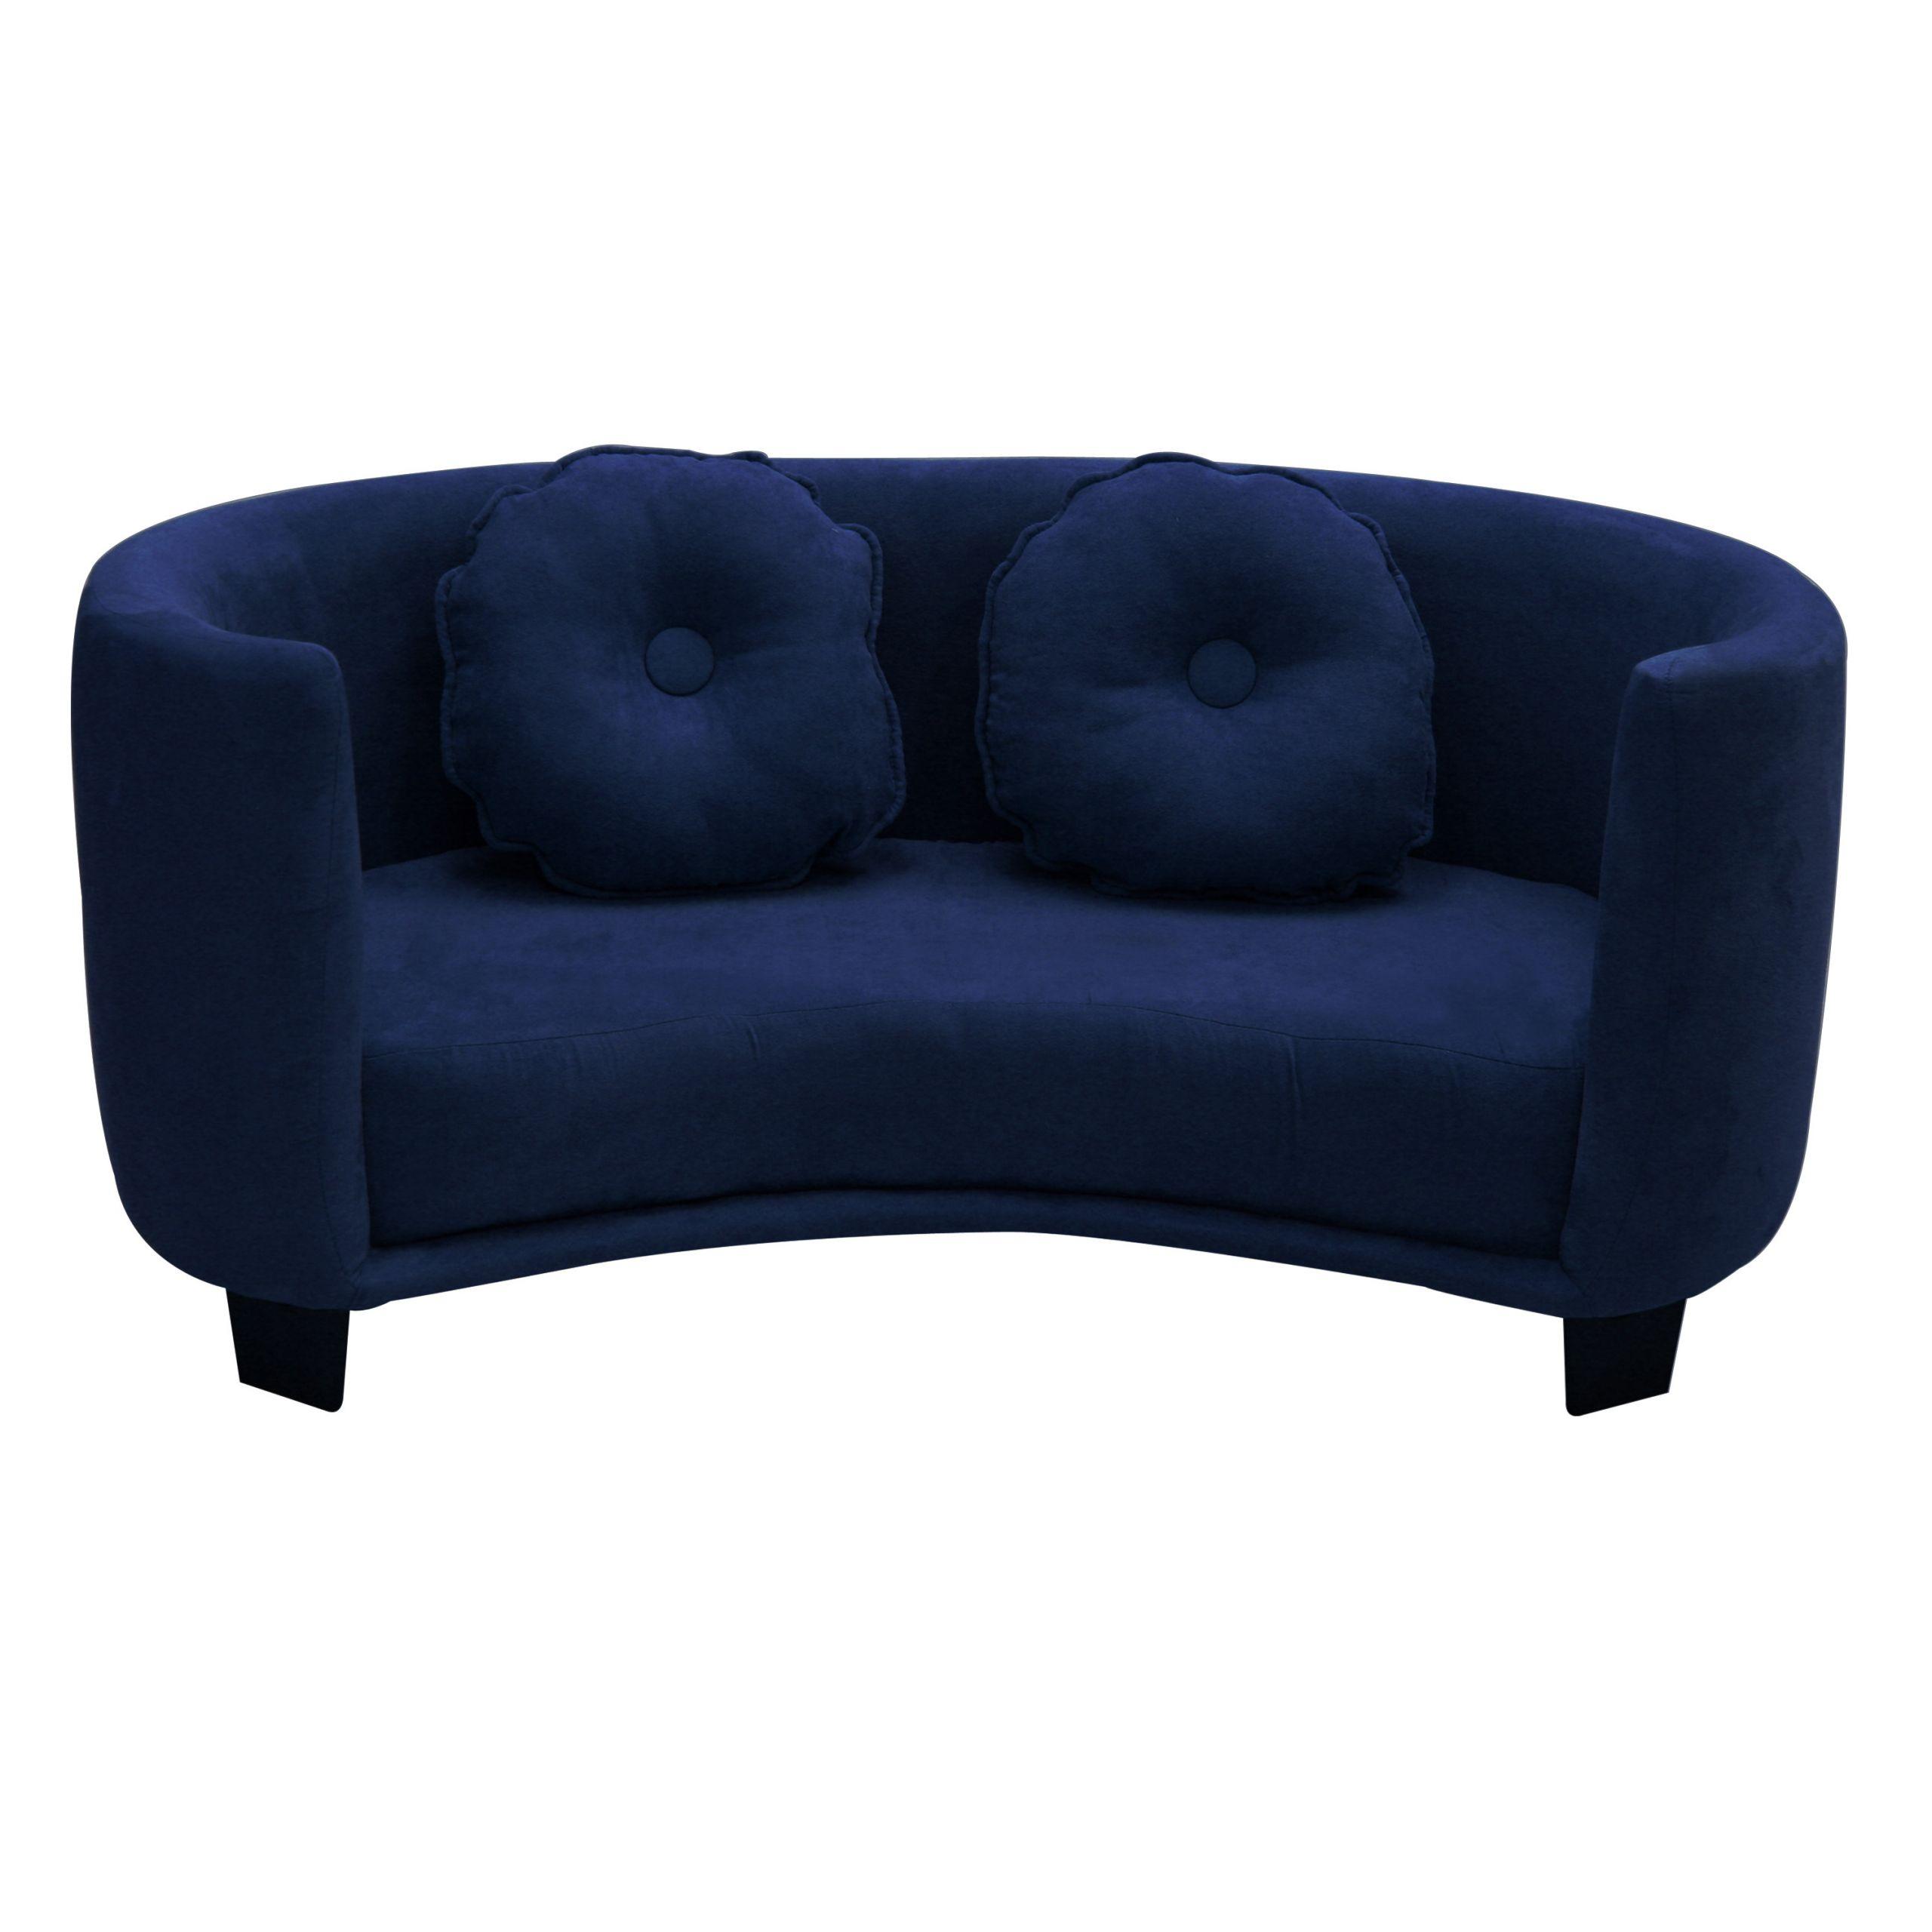 Kids Comfy Chair  Komfy Kings Kids fy Sofa Navy Blue Micro Baby